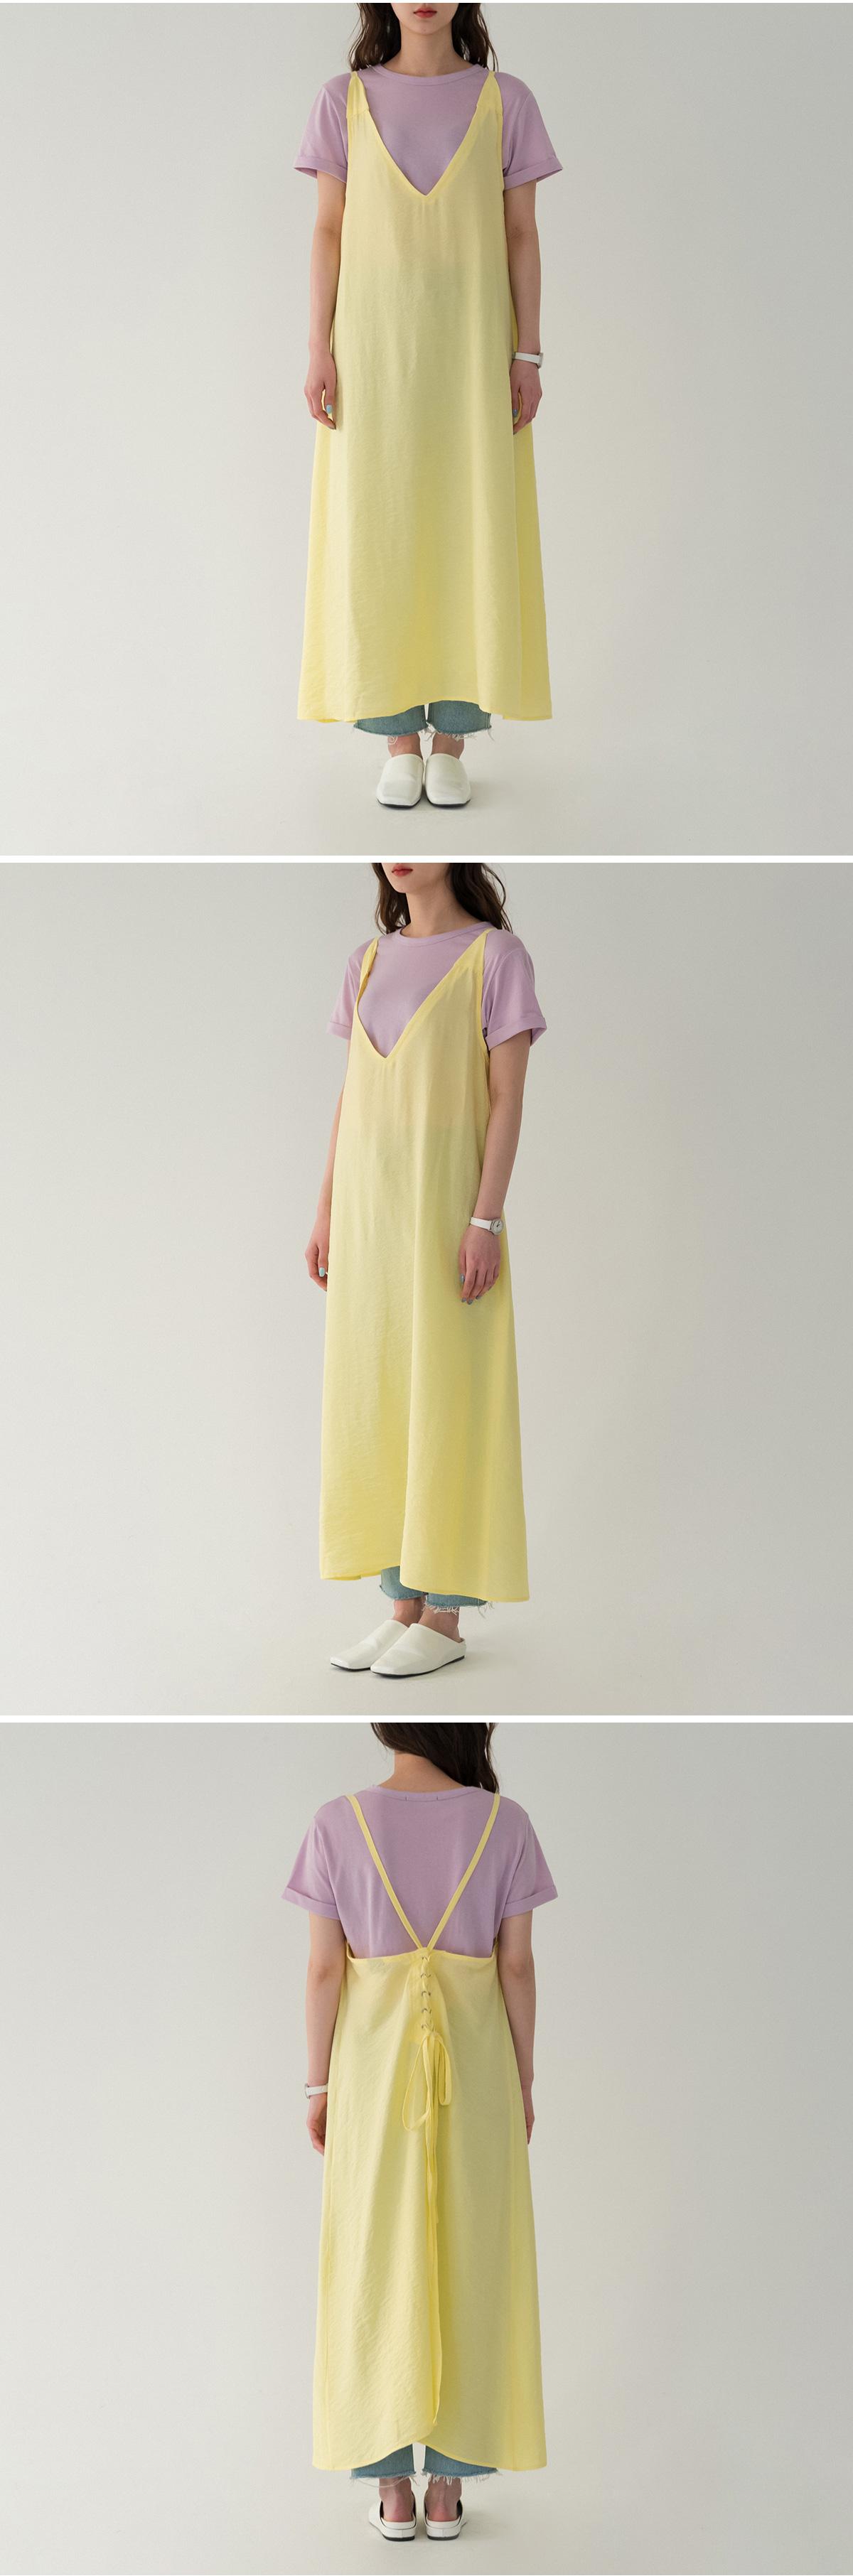 Eyelet Layered Long Dress